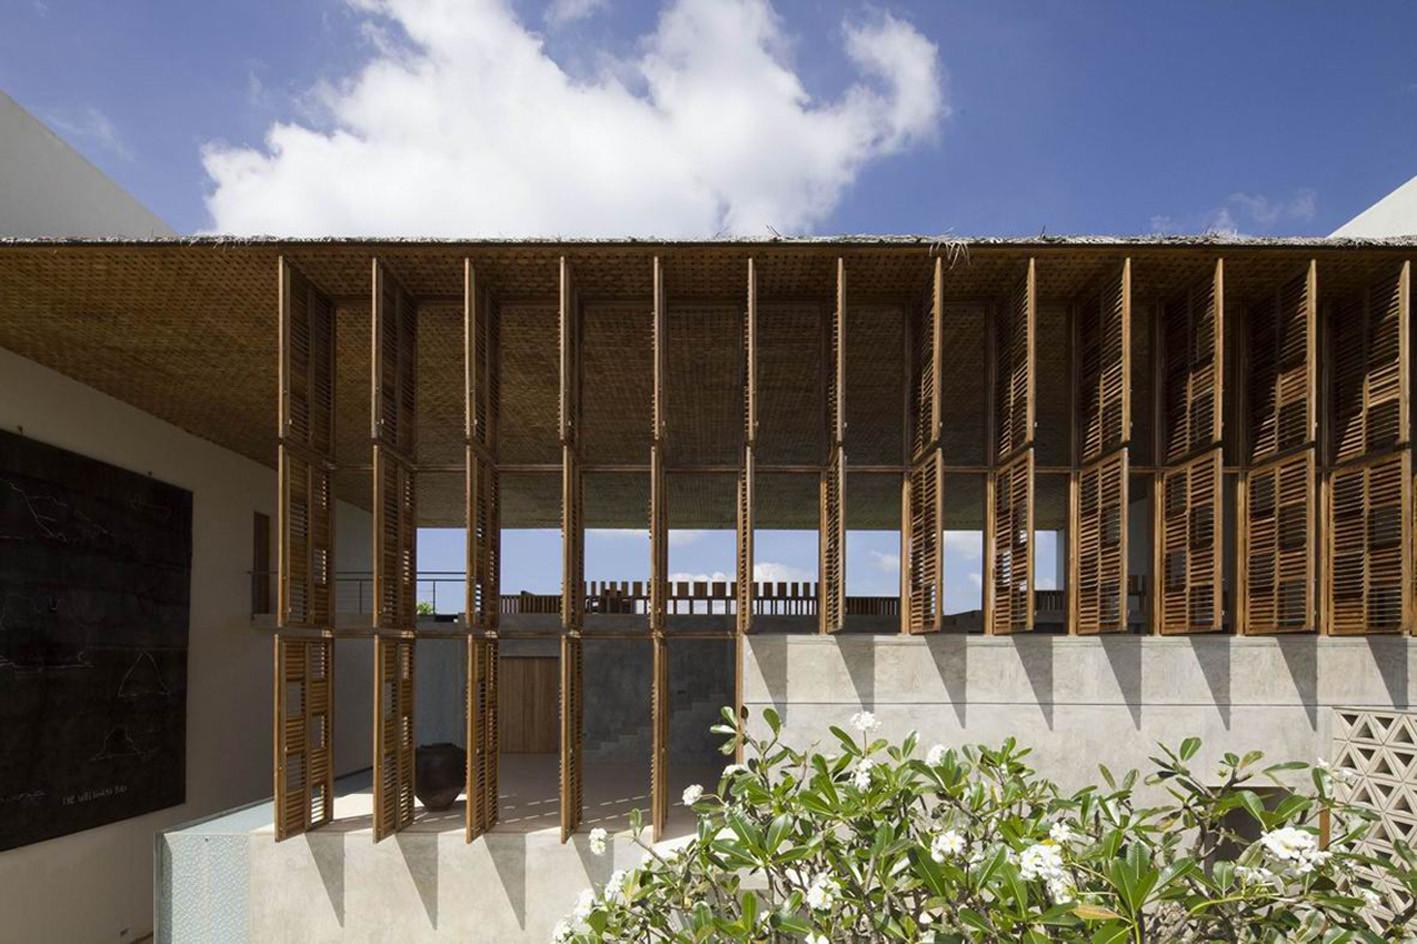 Galeria resid ncia vista shigeru ban architects 3 for Architecture ephemere shigeru ban